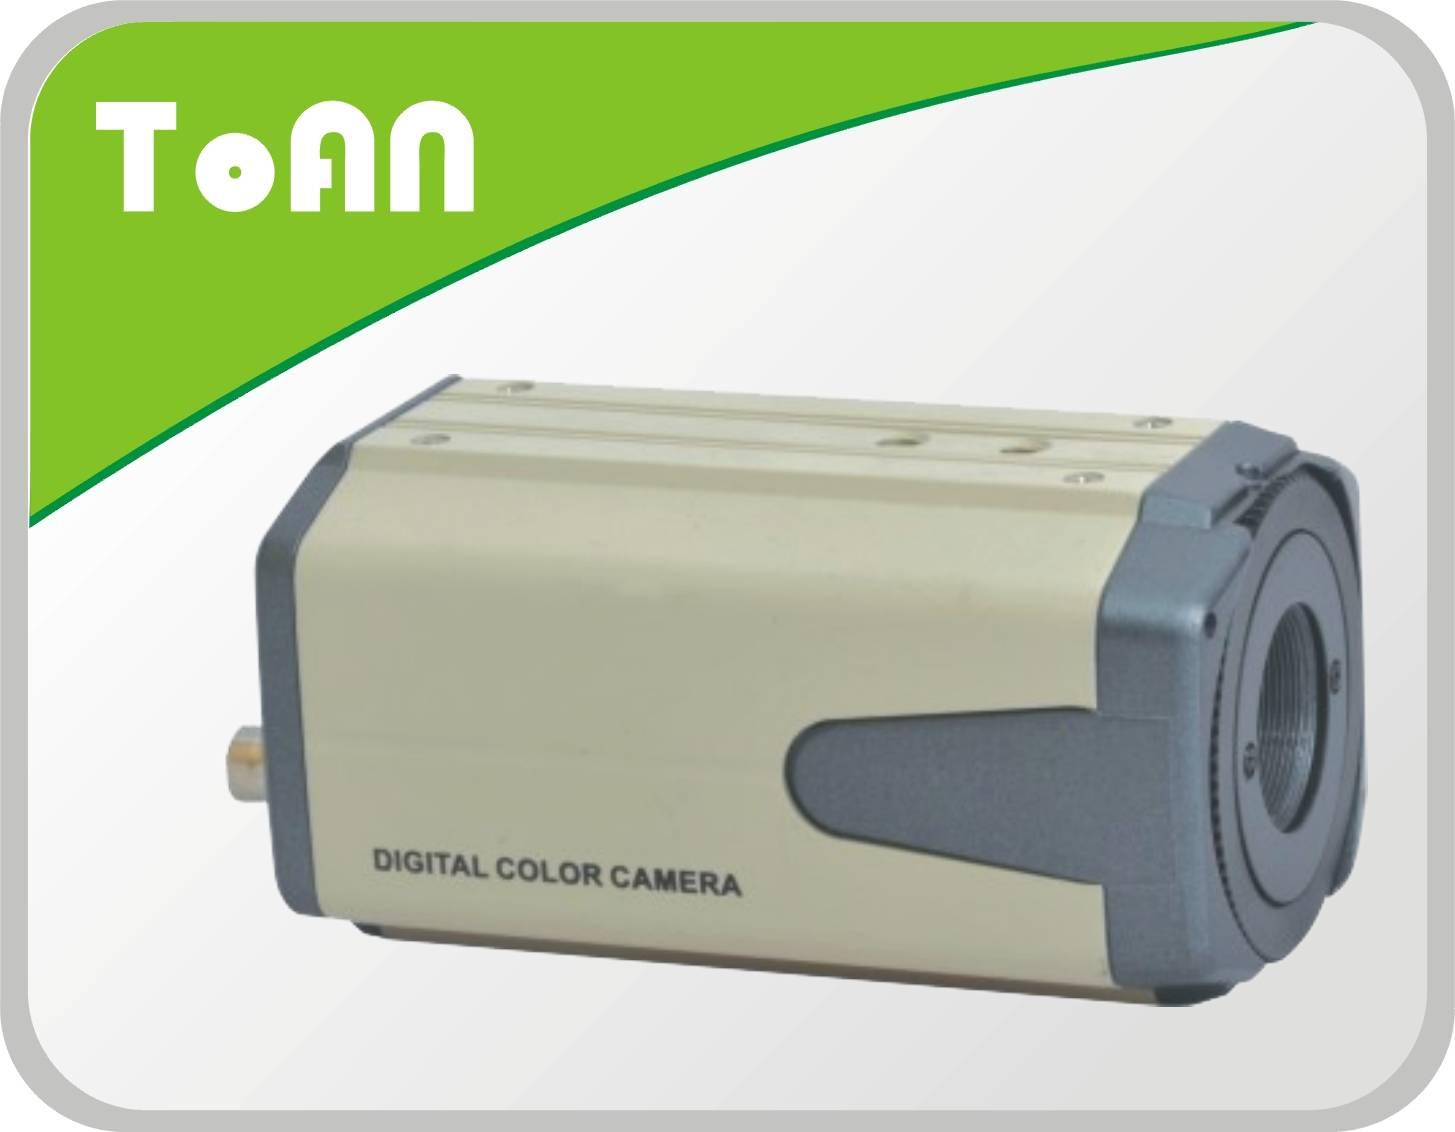 TOAN web camera surveillance Factory mini hd digital camera